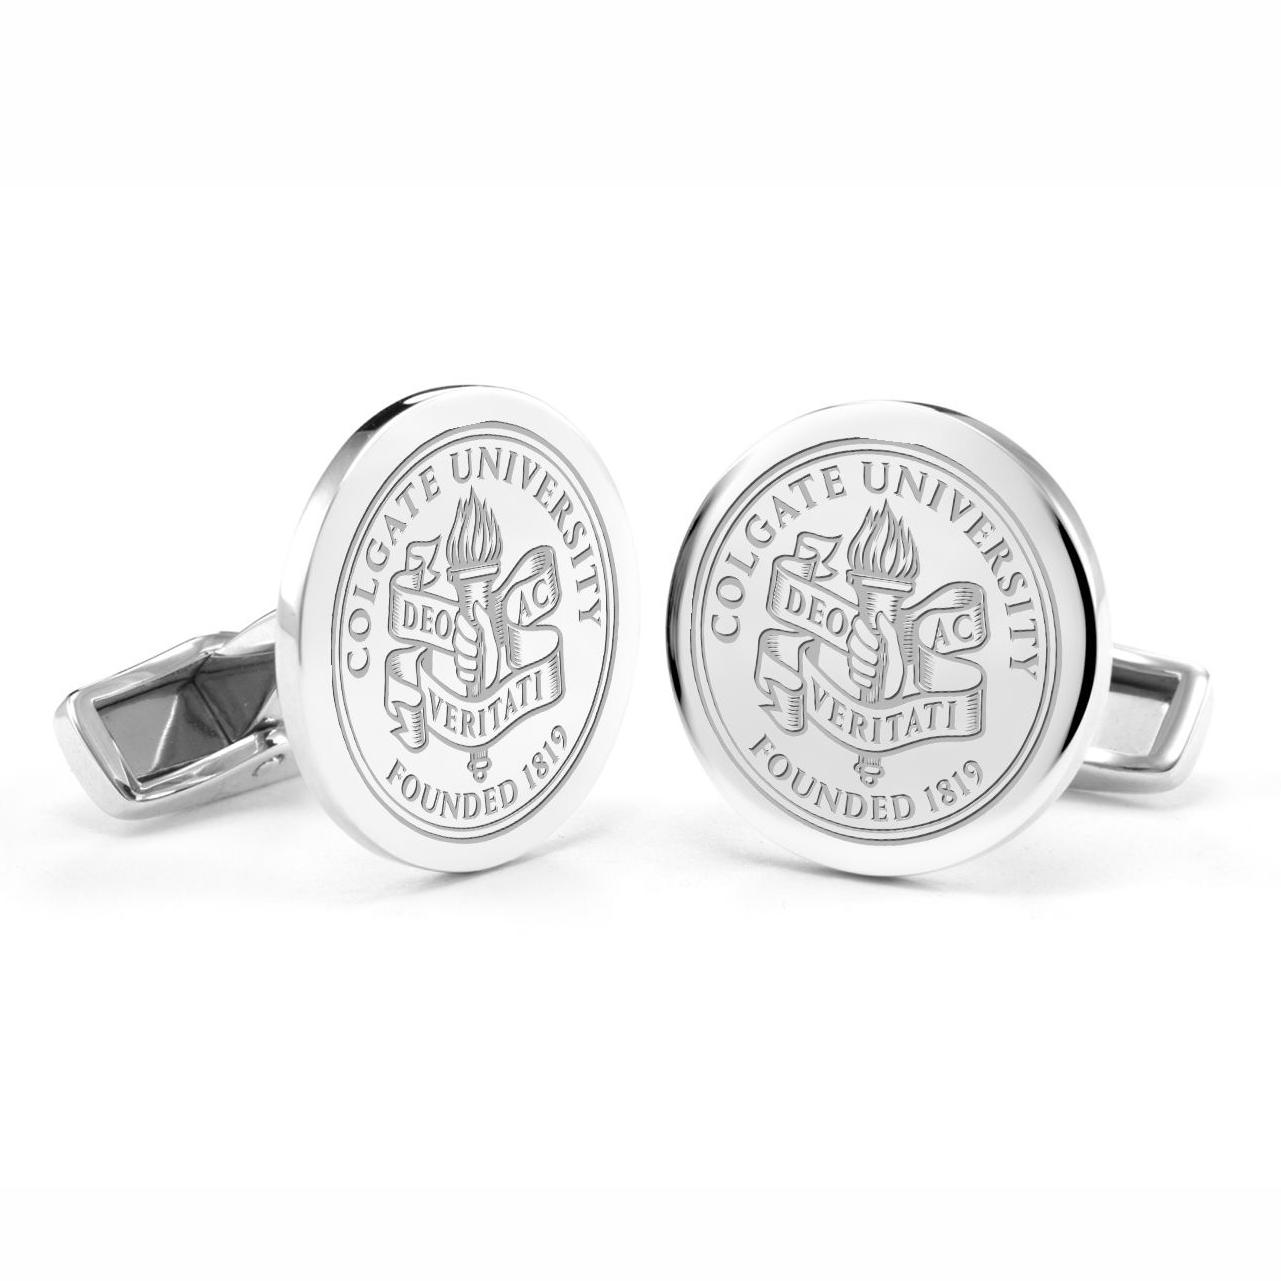 Colgate Sterling Silver Cufflinks